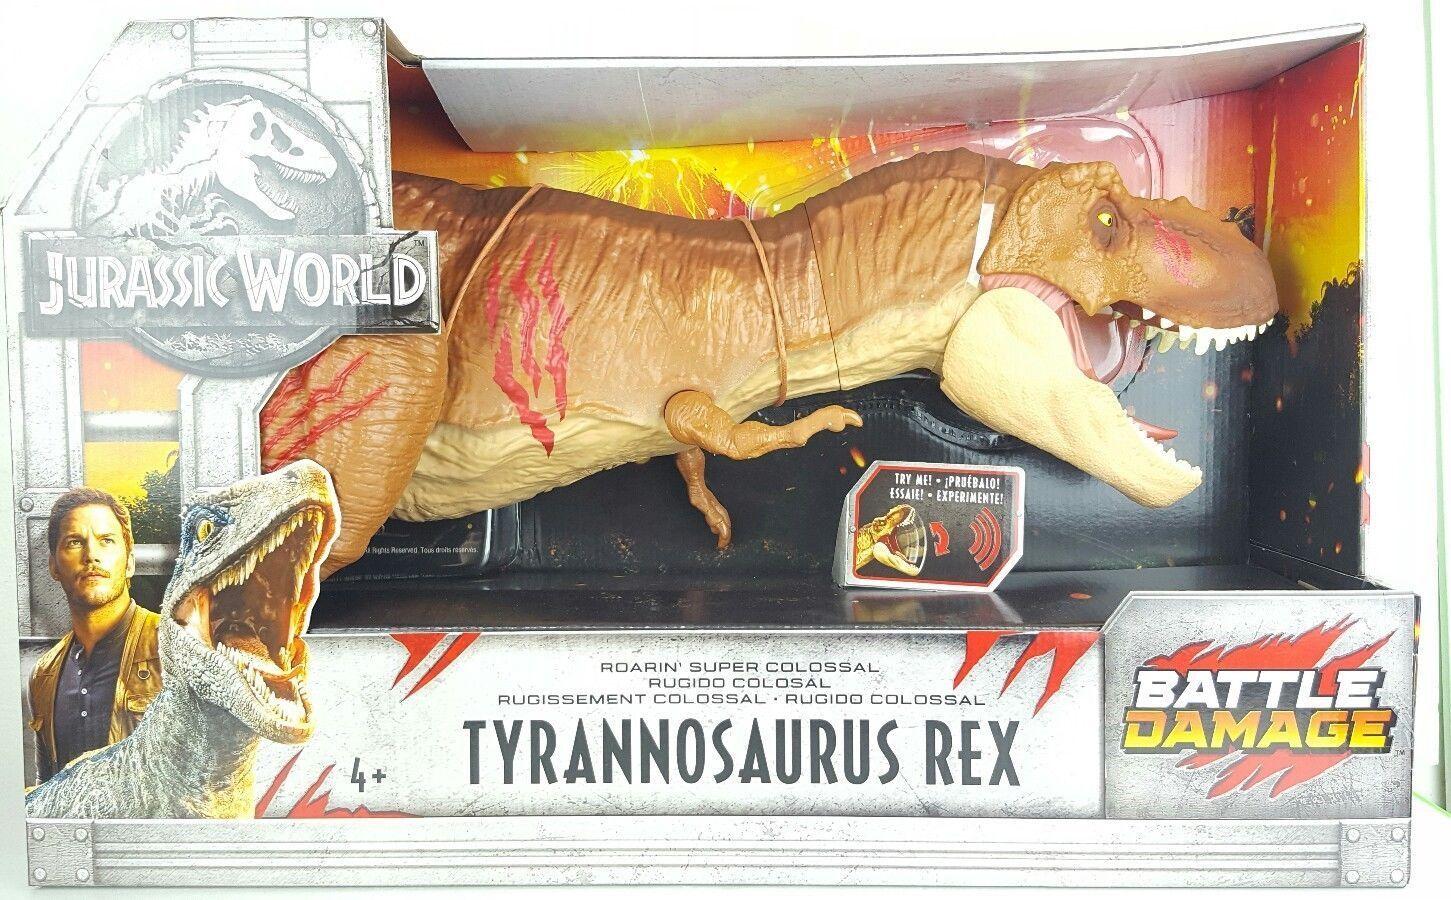 Jurassic World caído Reino súper colosal T Rex daño de batalla